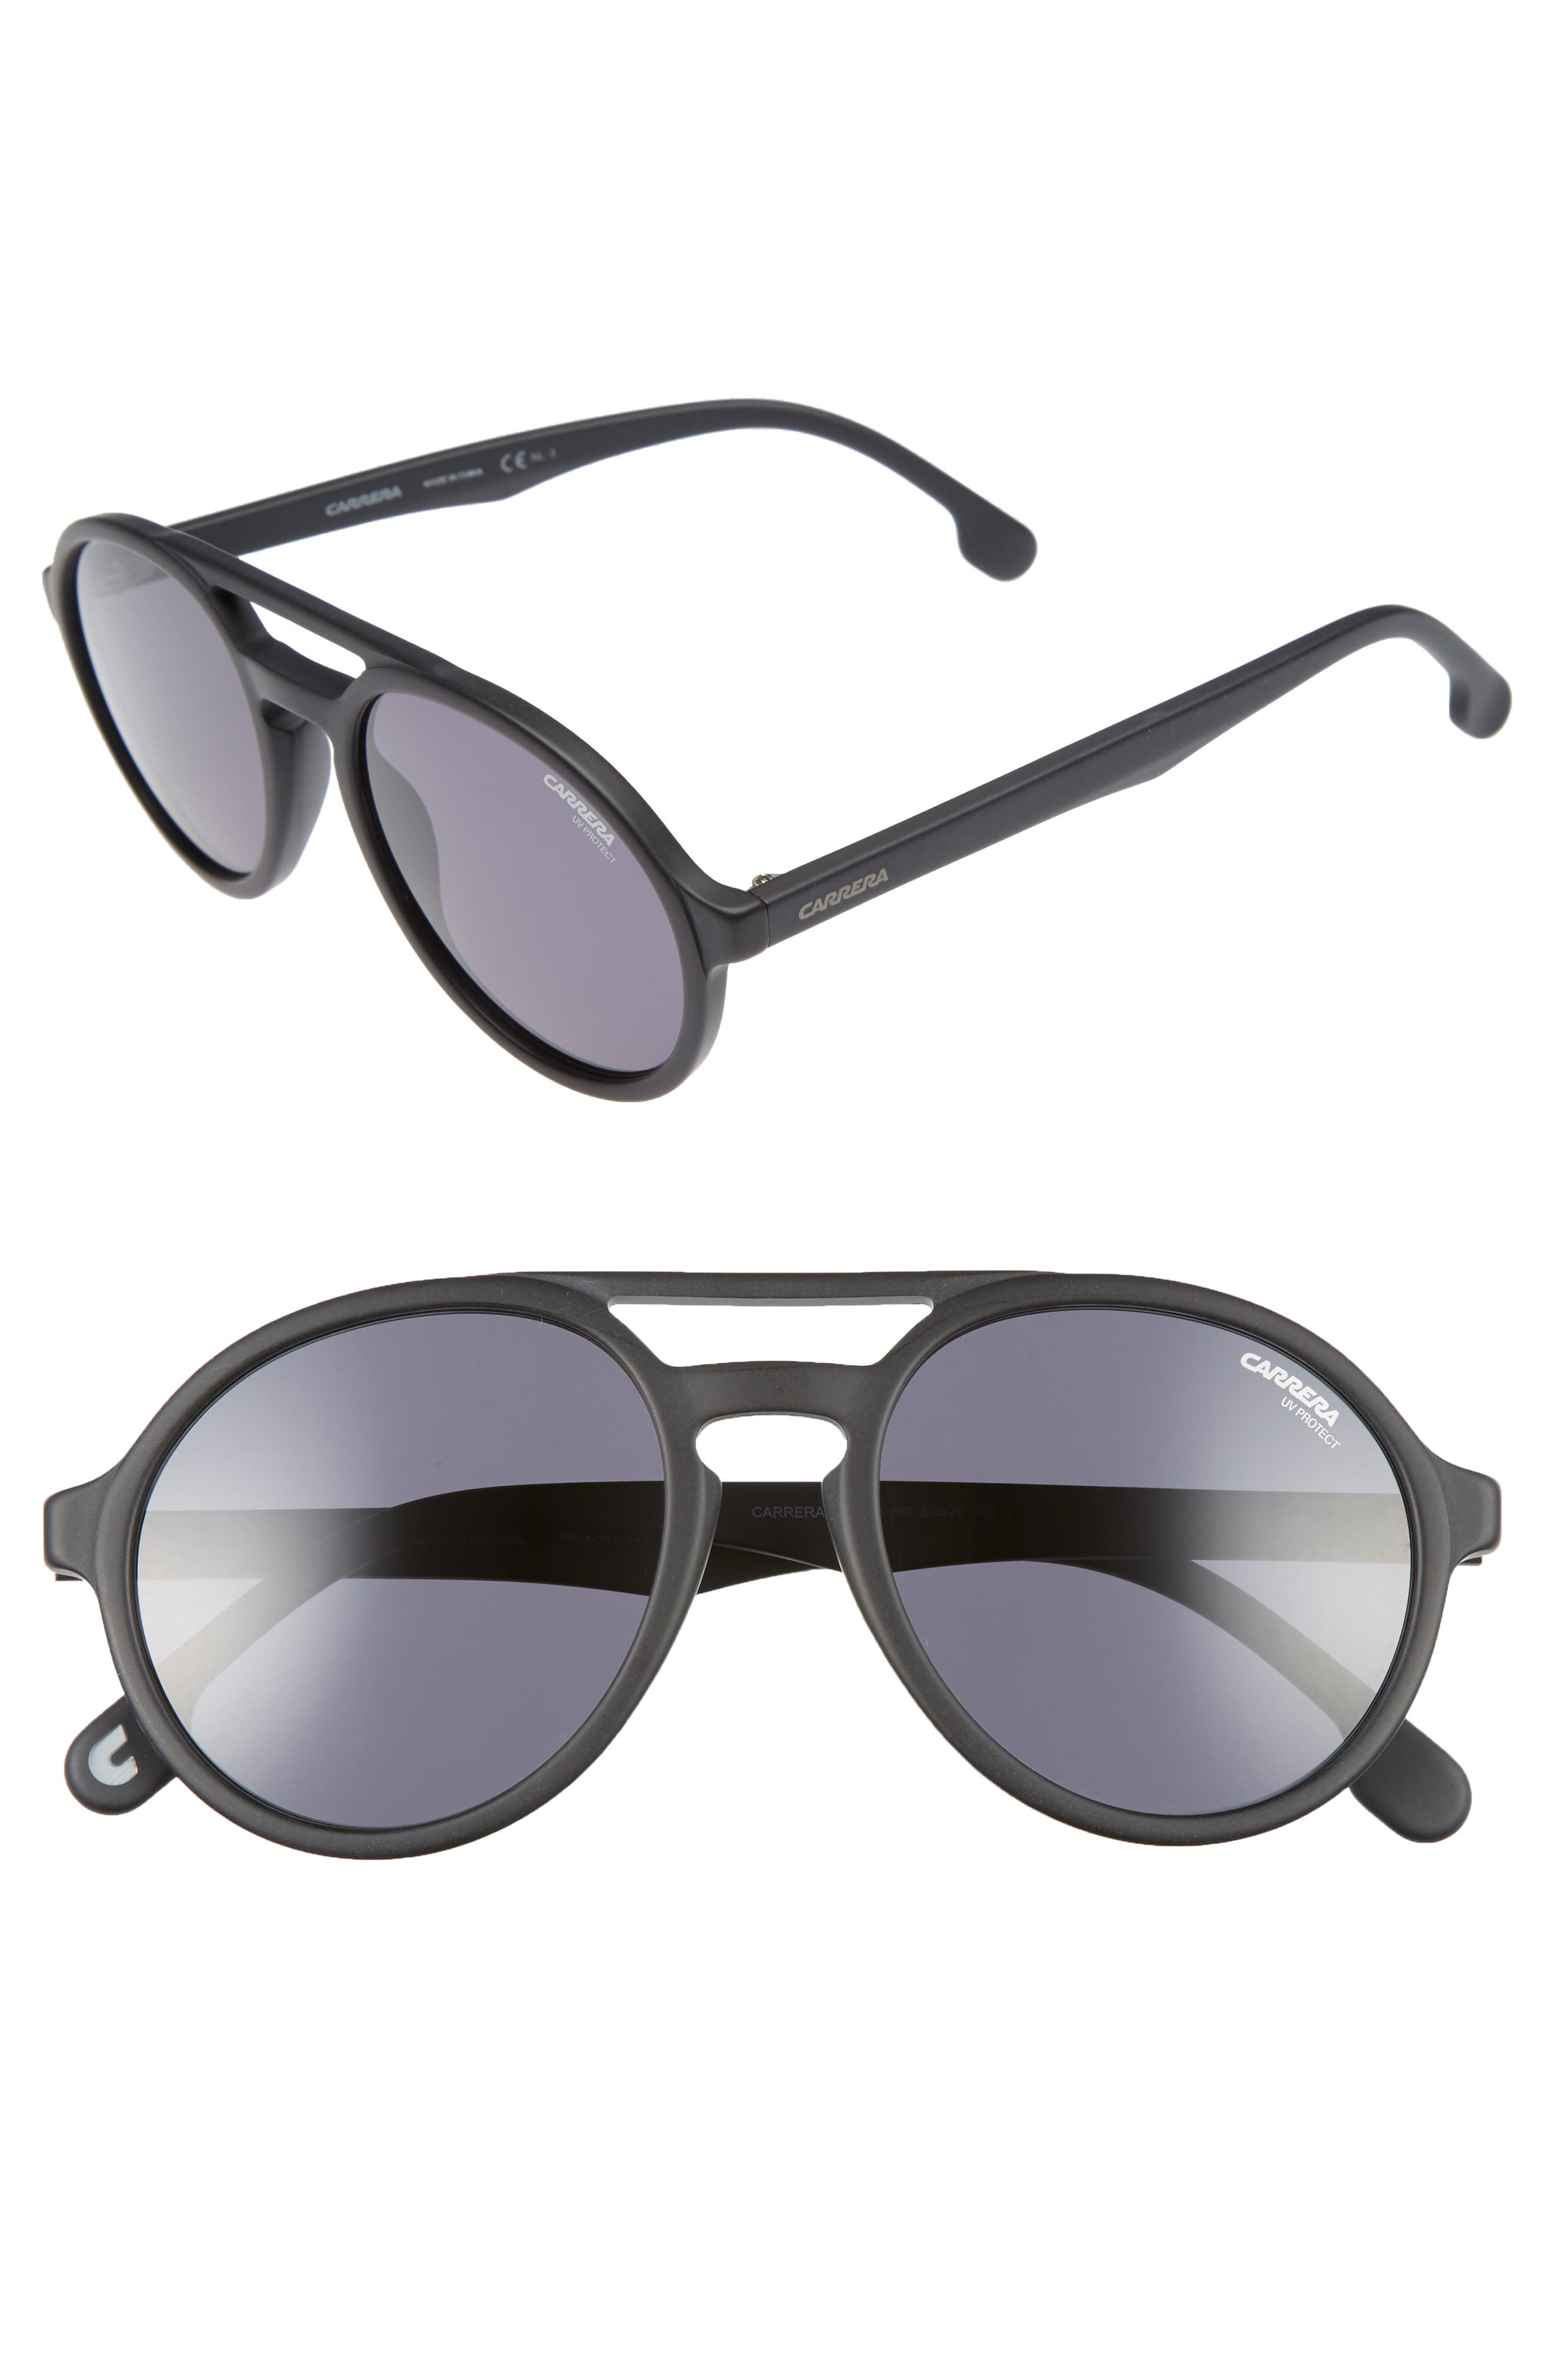 Carrera Eyewear Pace 53mm Sunglasses